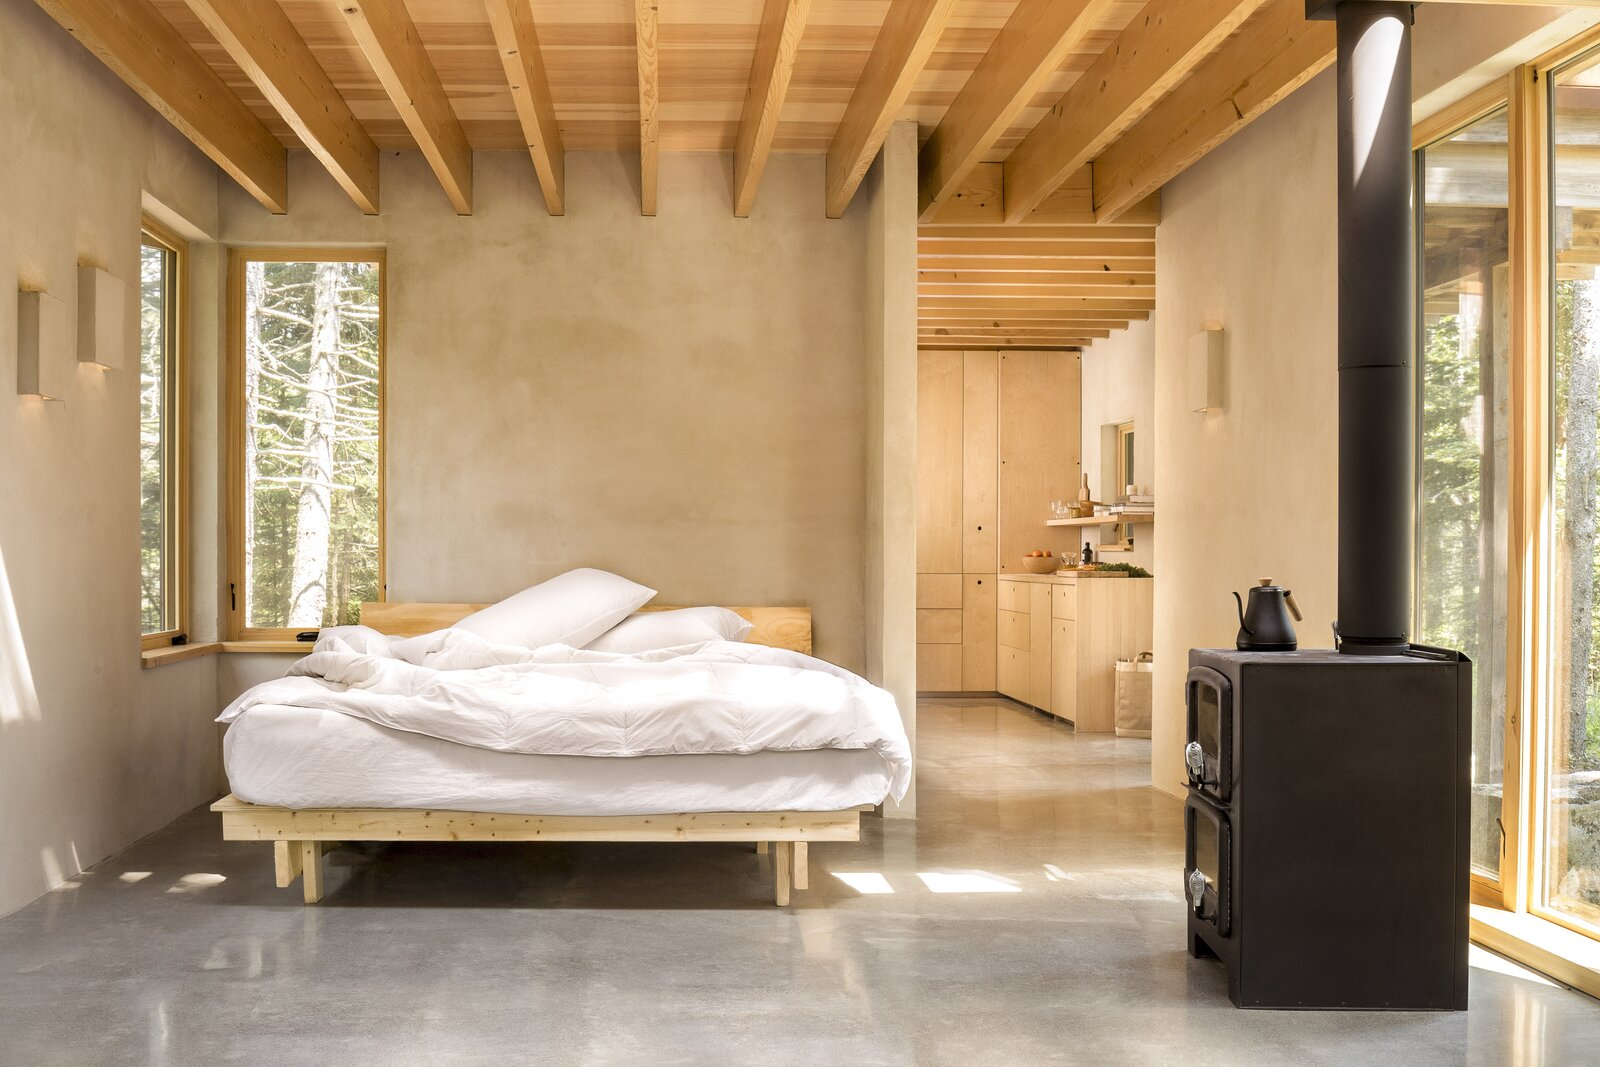 The Far Cabin by Winkelman Architecture